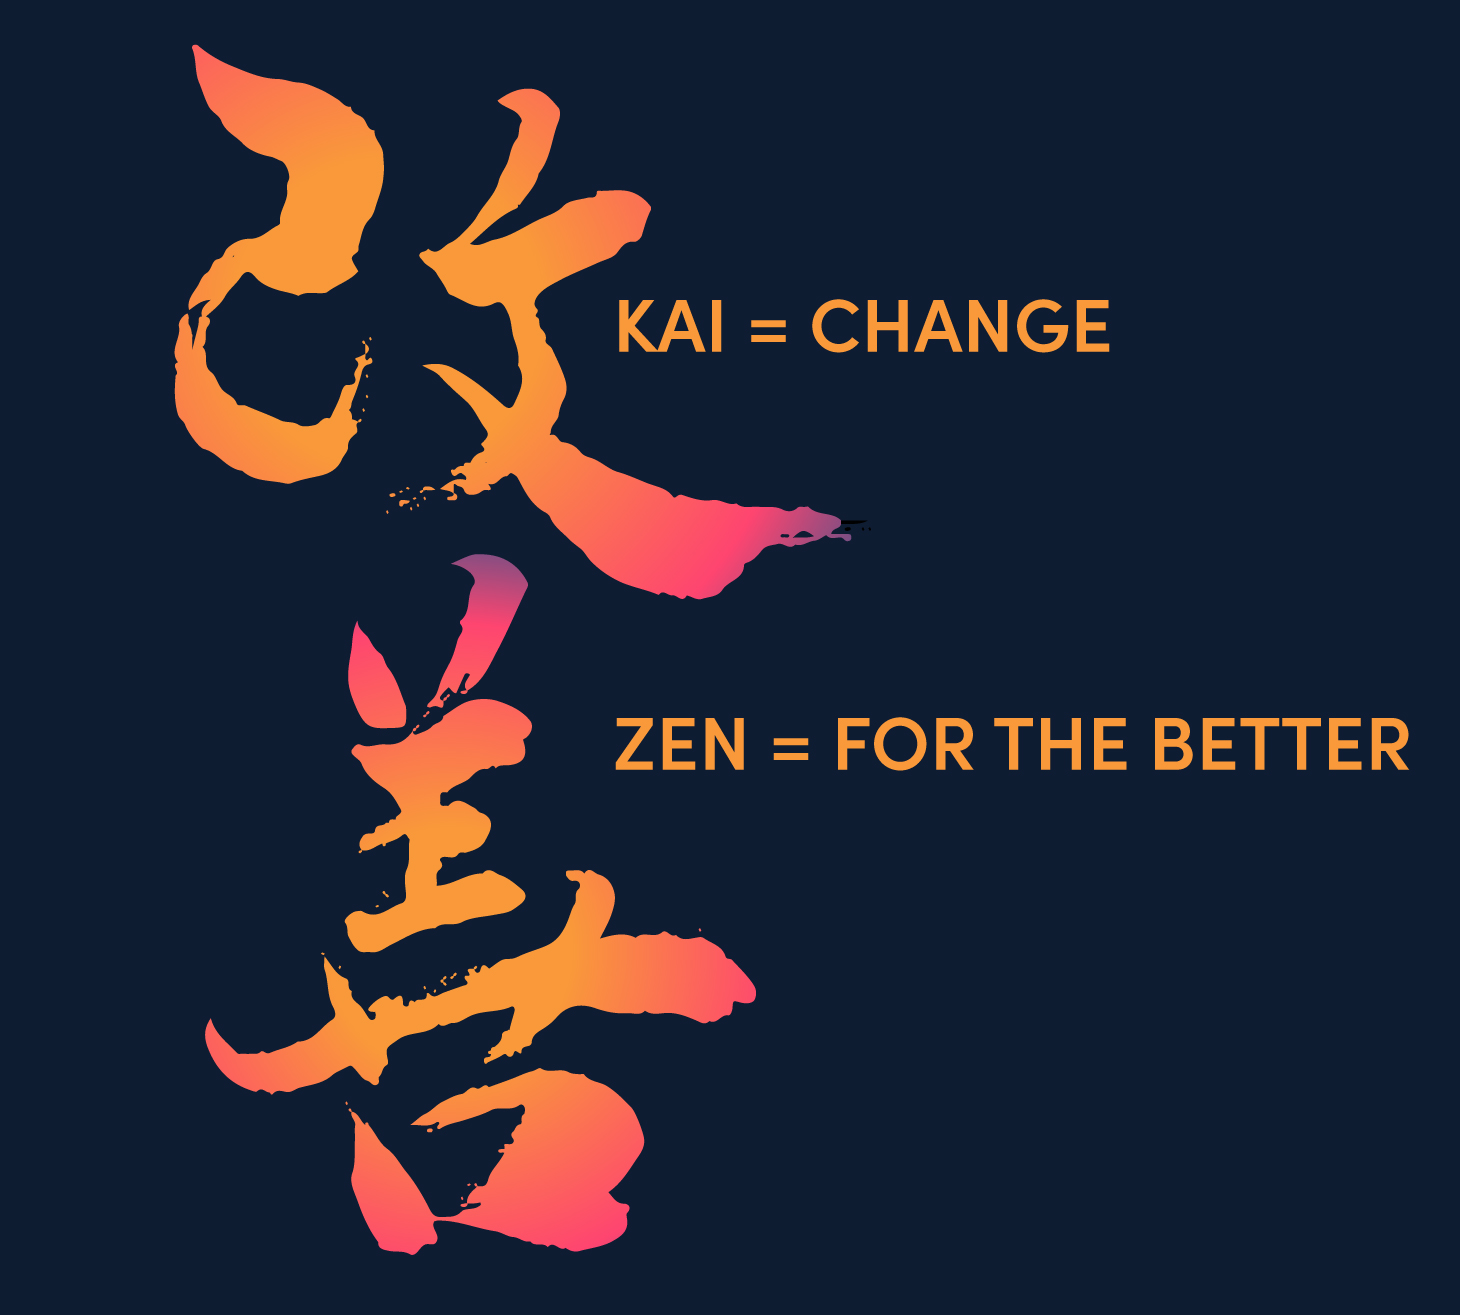 Kaizen script in Japanese